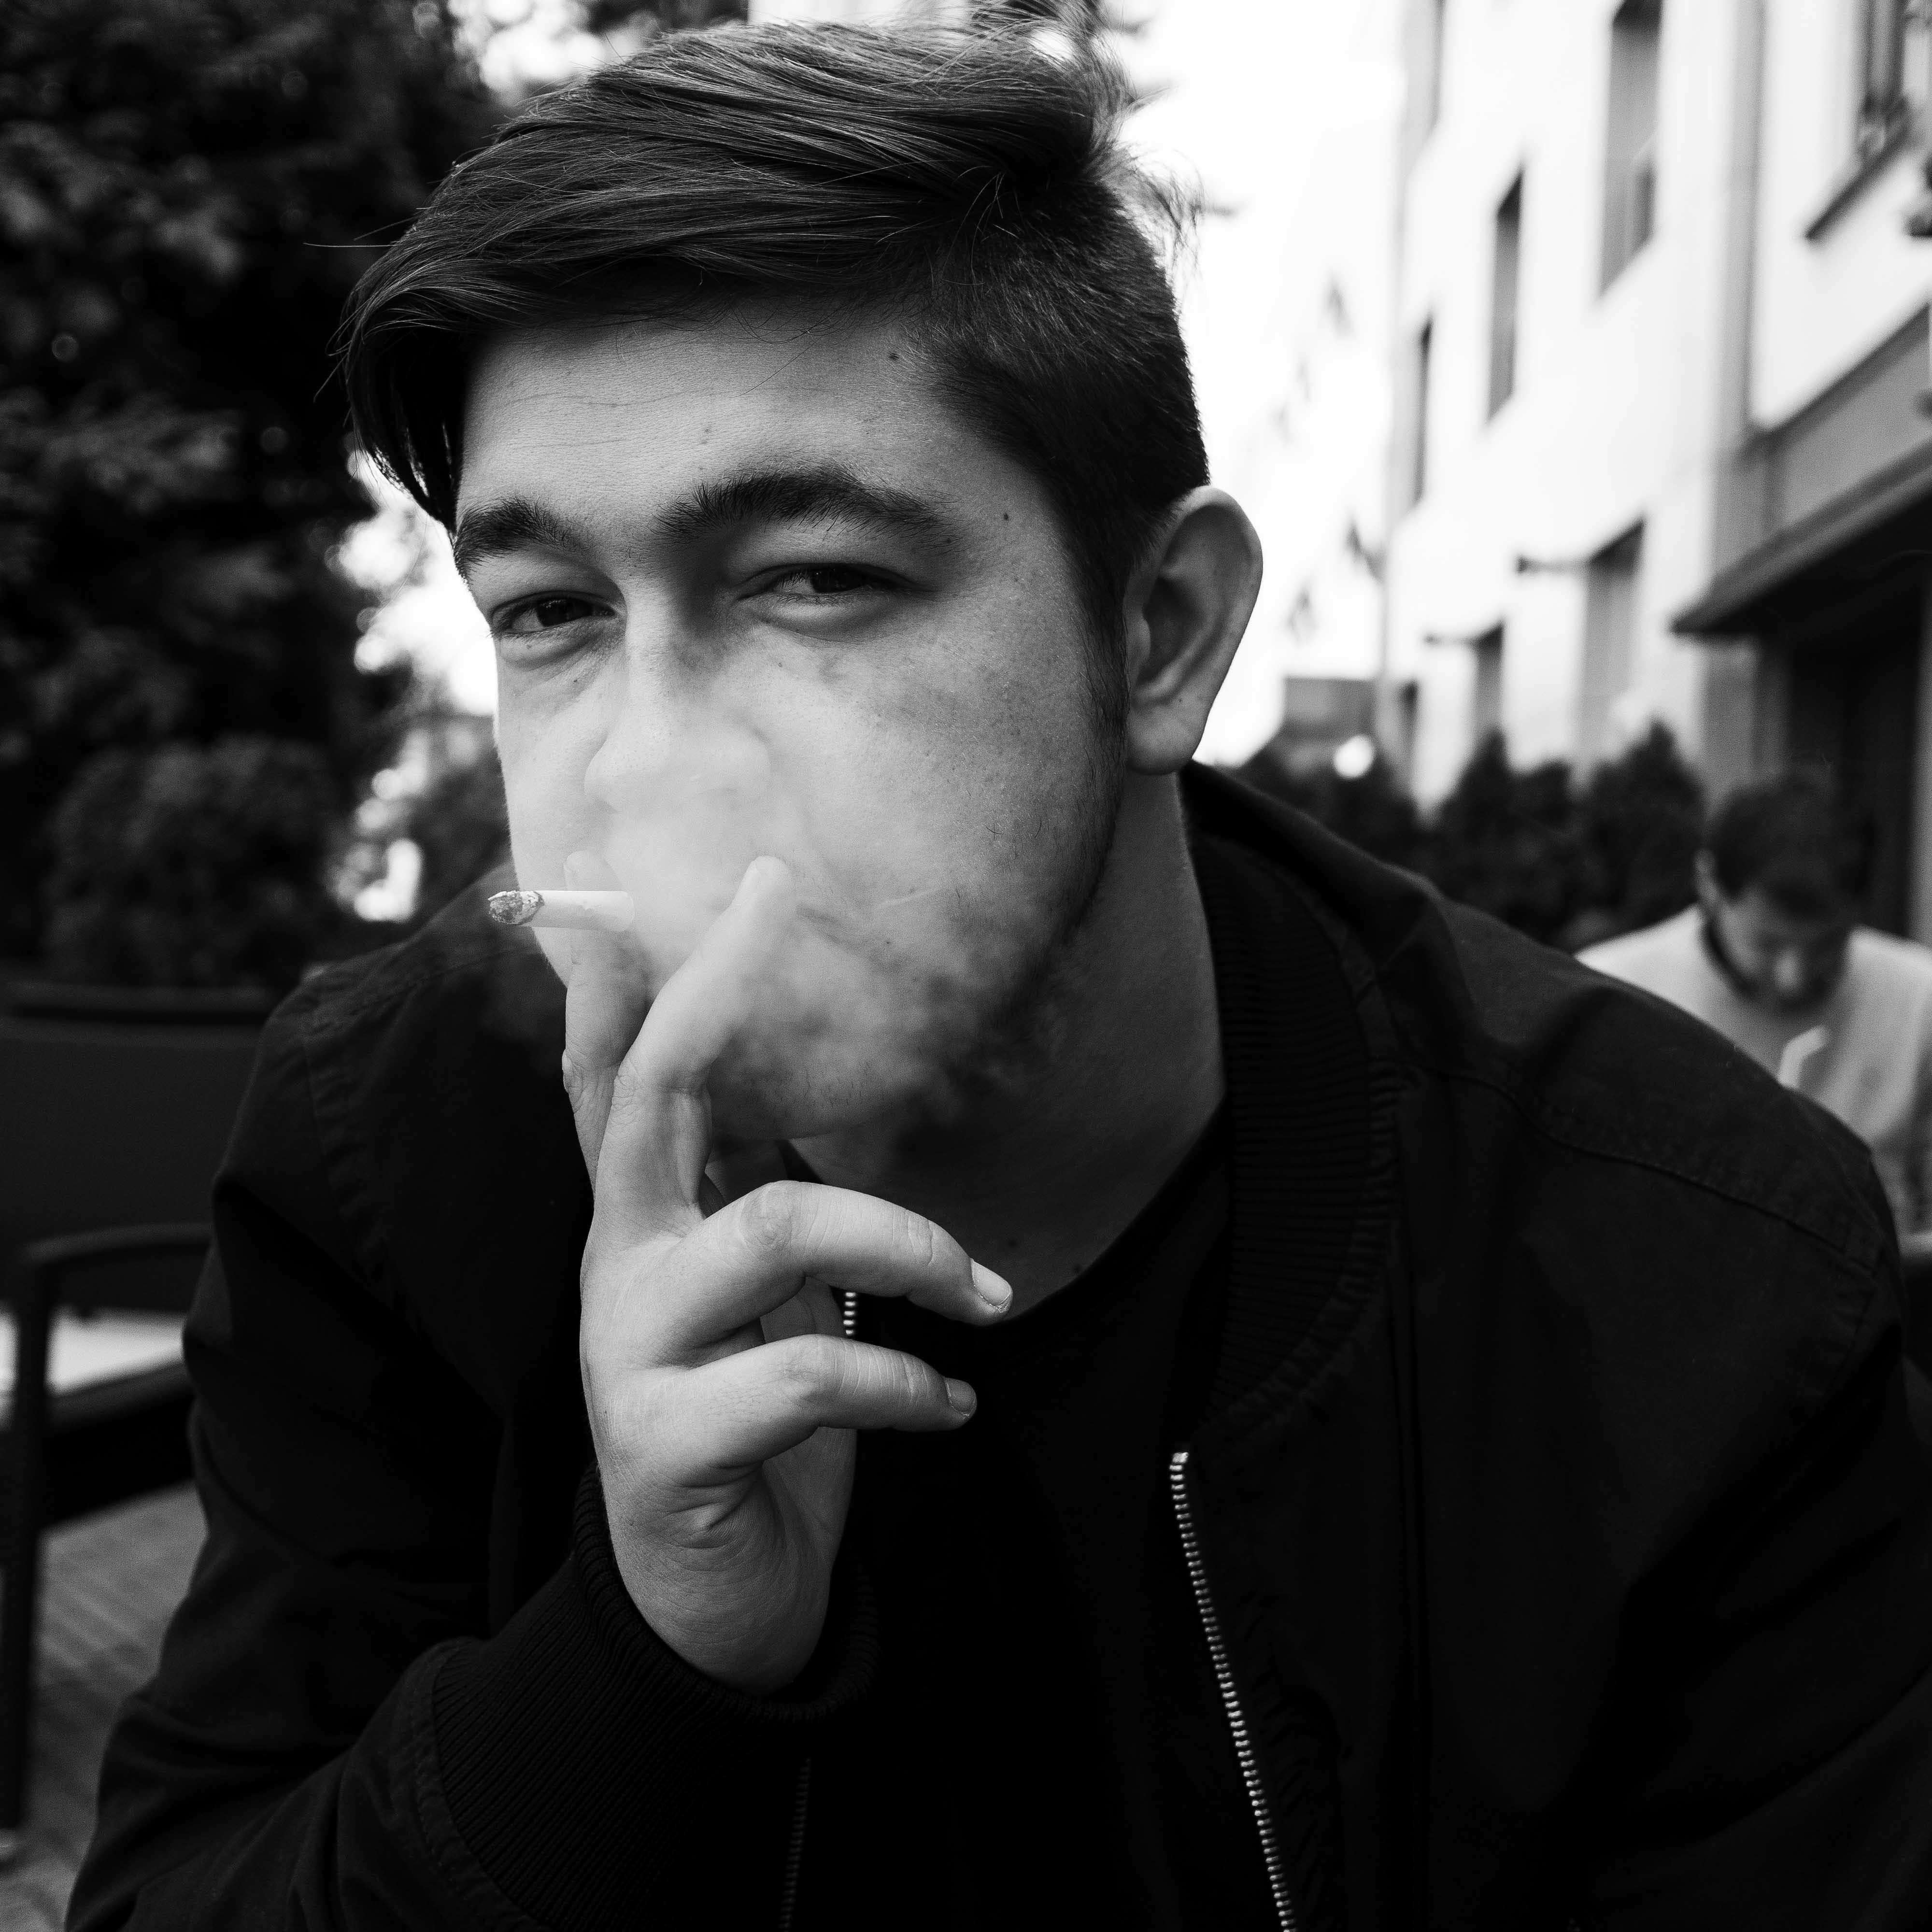 Go to Marko Dukic's profile